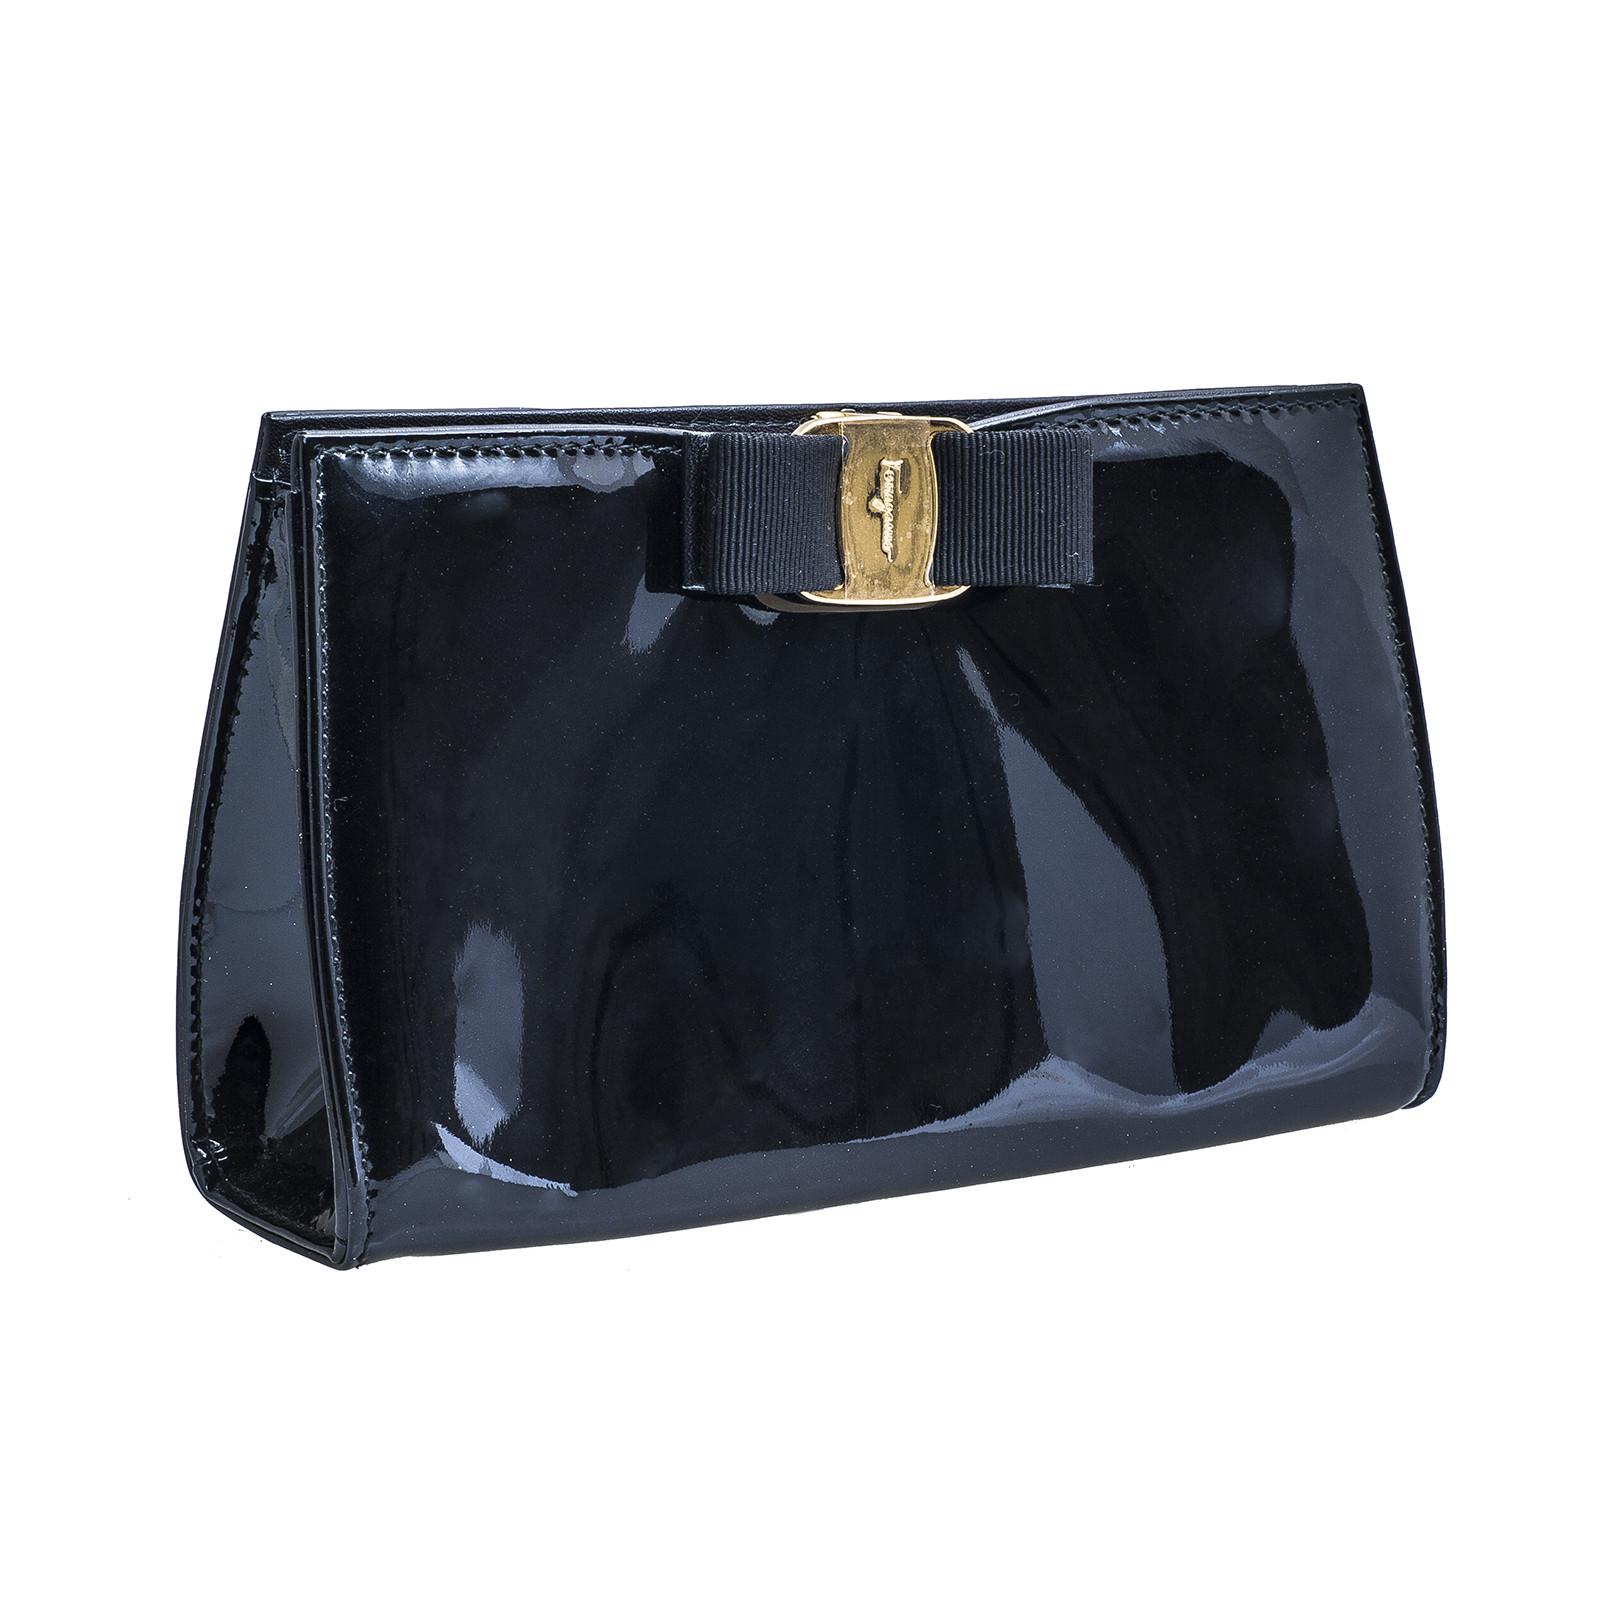 Vintage Ferragamo Black Vara Patent Leather Piuma Clutch